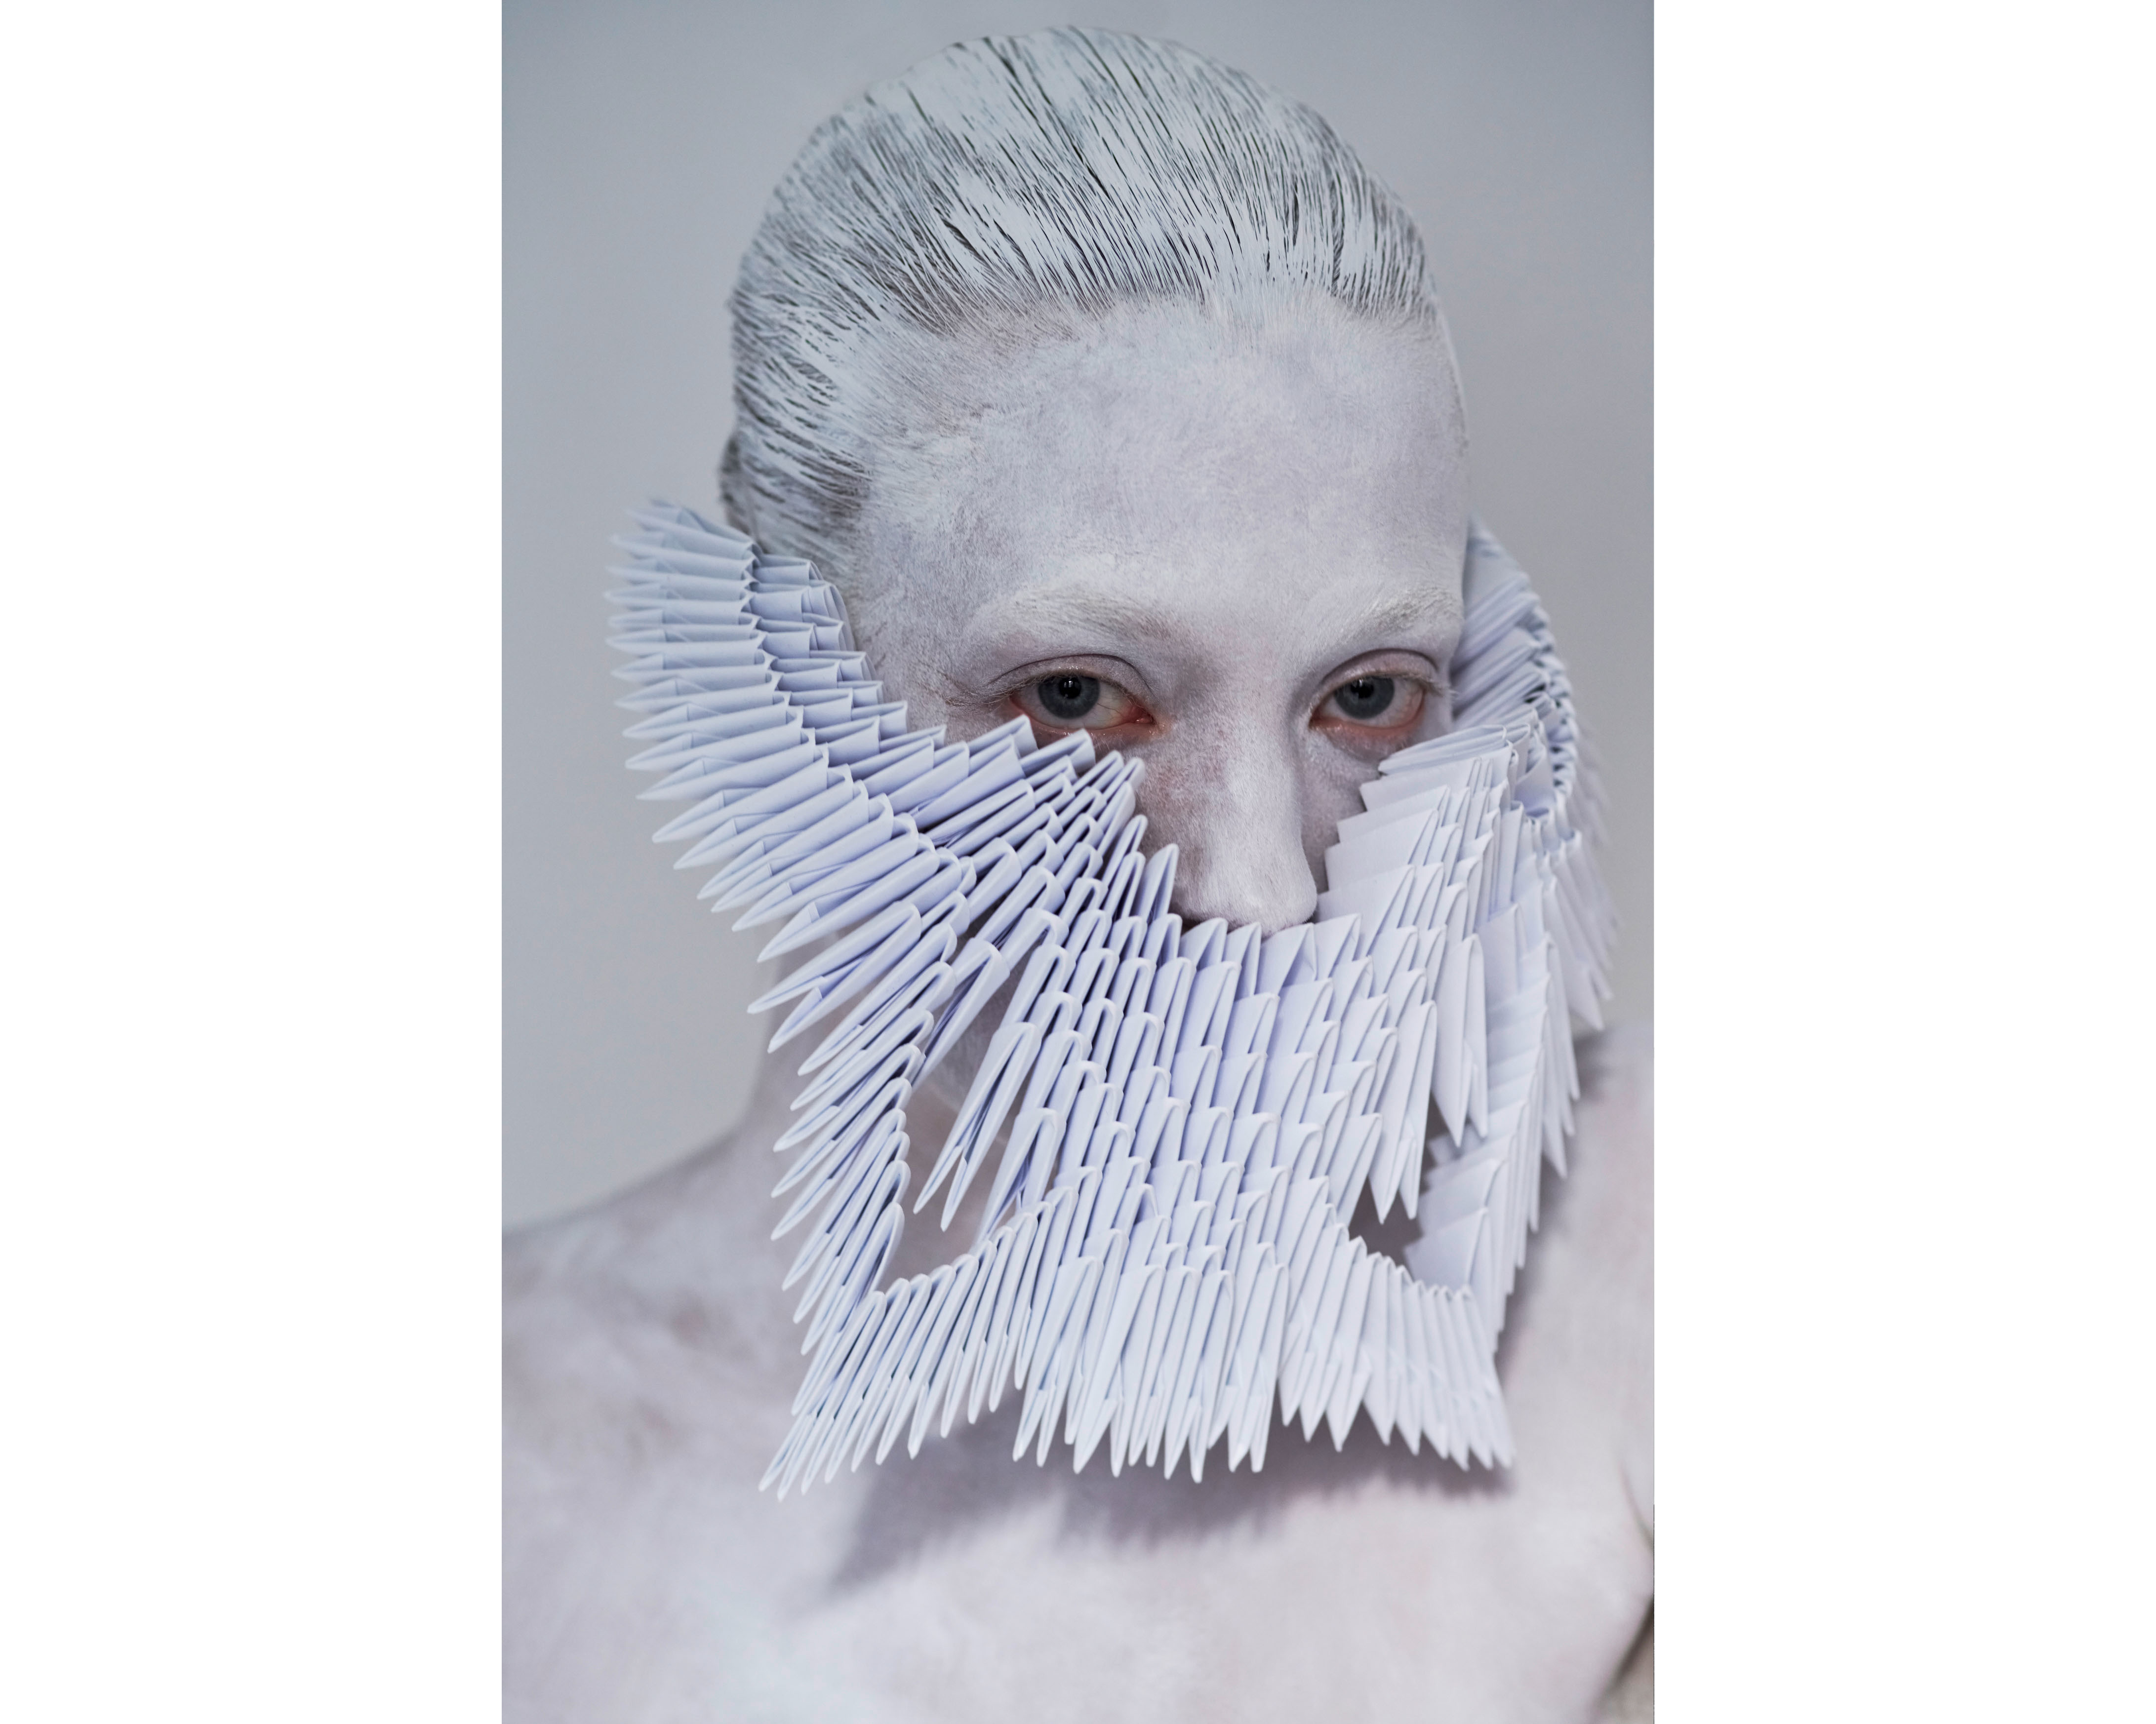 model: marie louwes @marie.louwes c/o @megamodelagency mask by lara packheiser @larapackheiser foto by thomas rusch @thomasrusch #20mask20